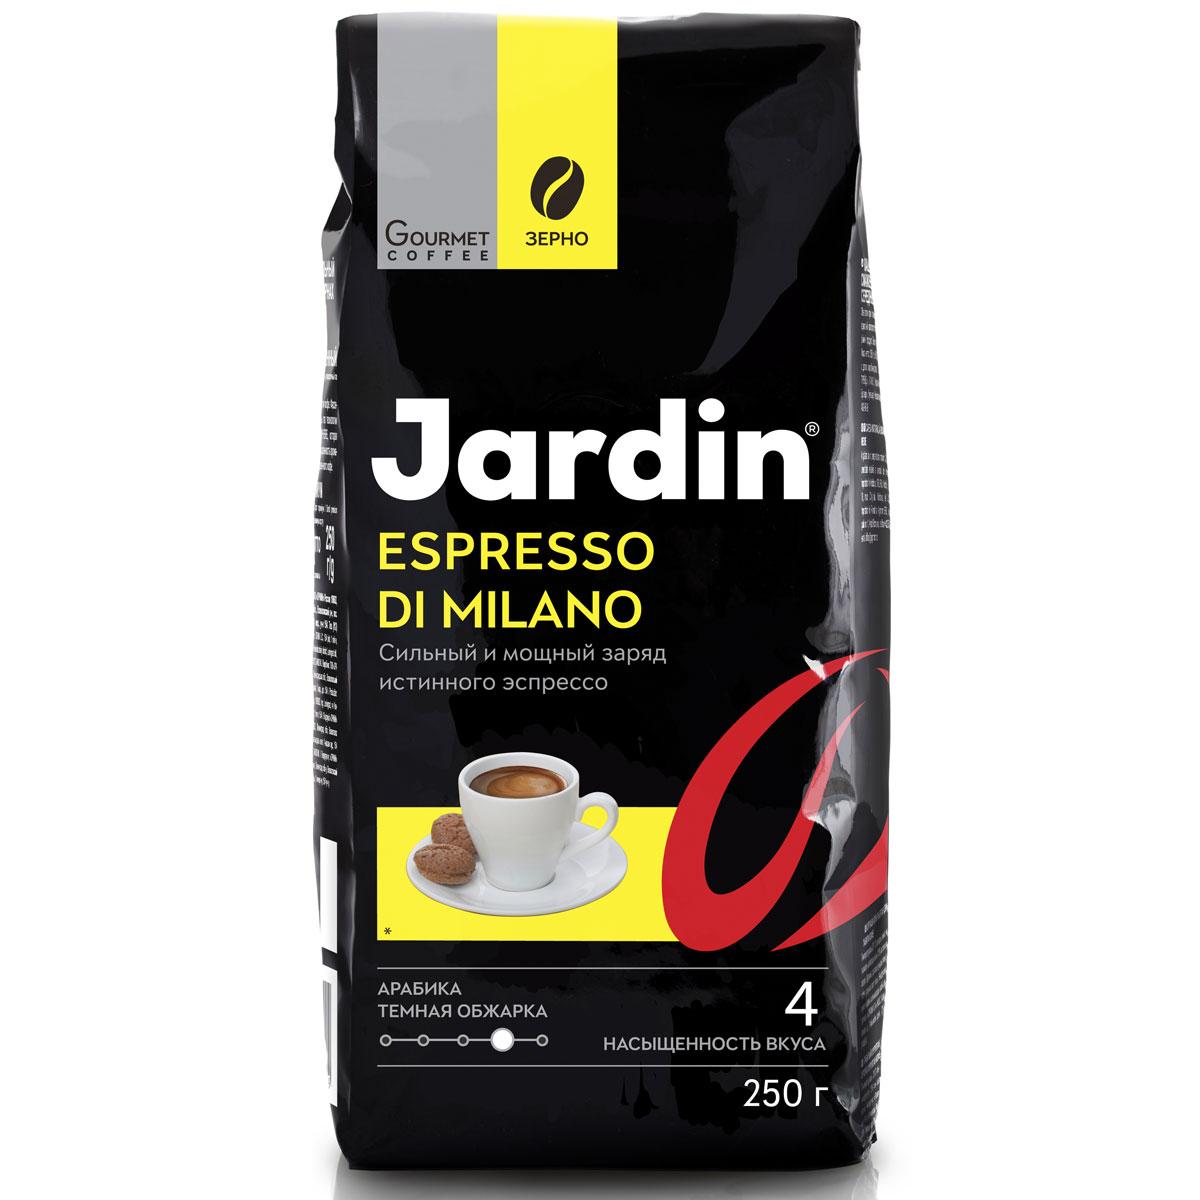 Jardin Espresso Di Milano кофе в зернах, 250 г